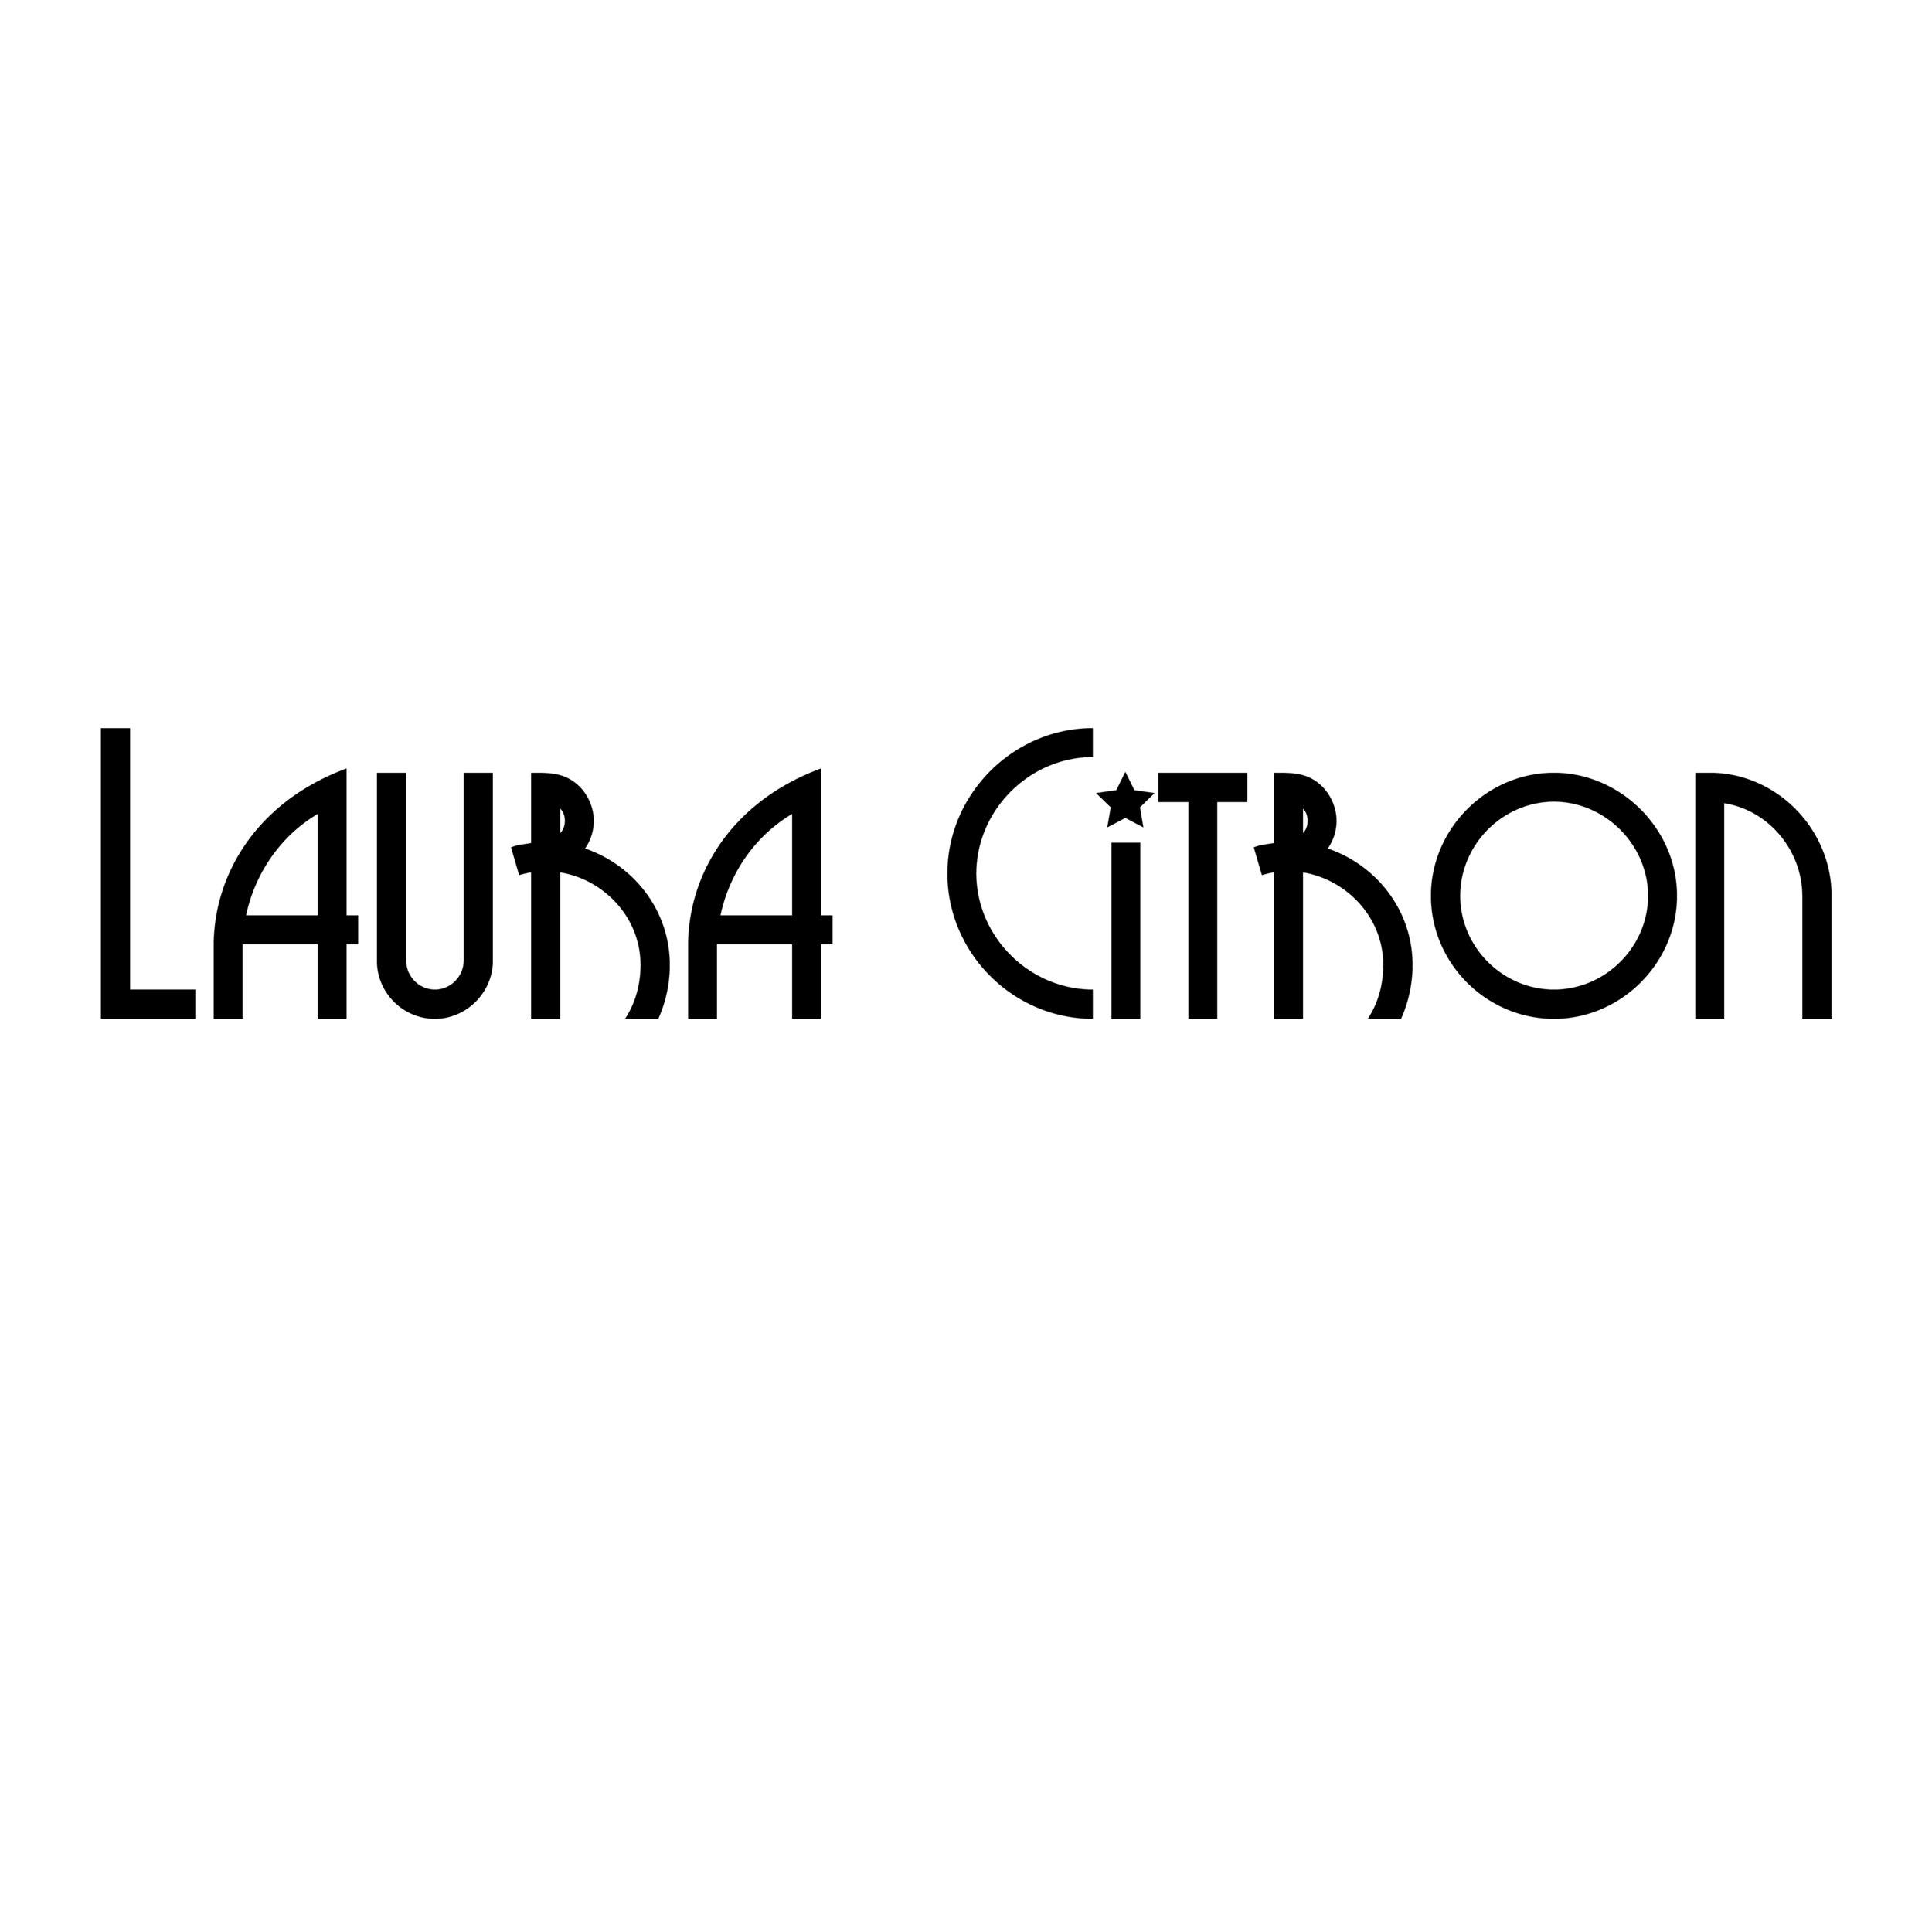 Laura Citron Logo.jpg